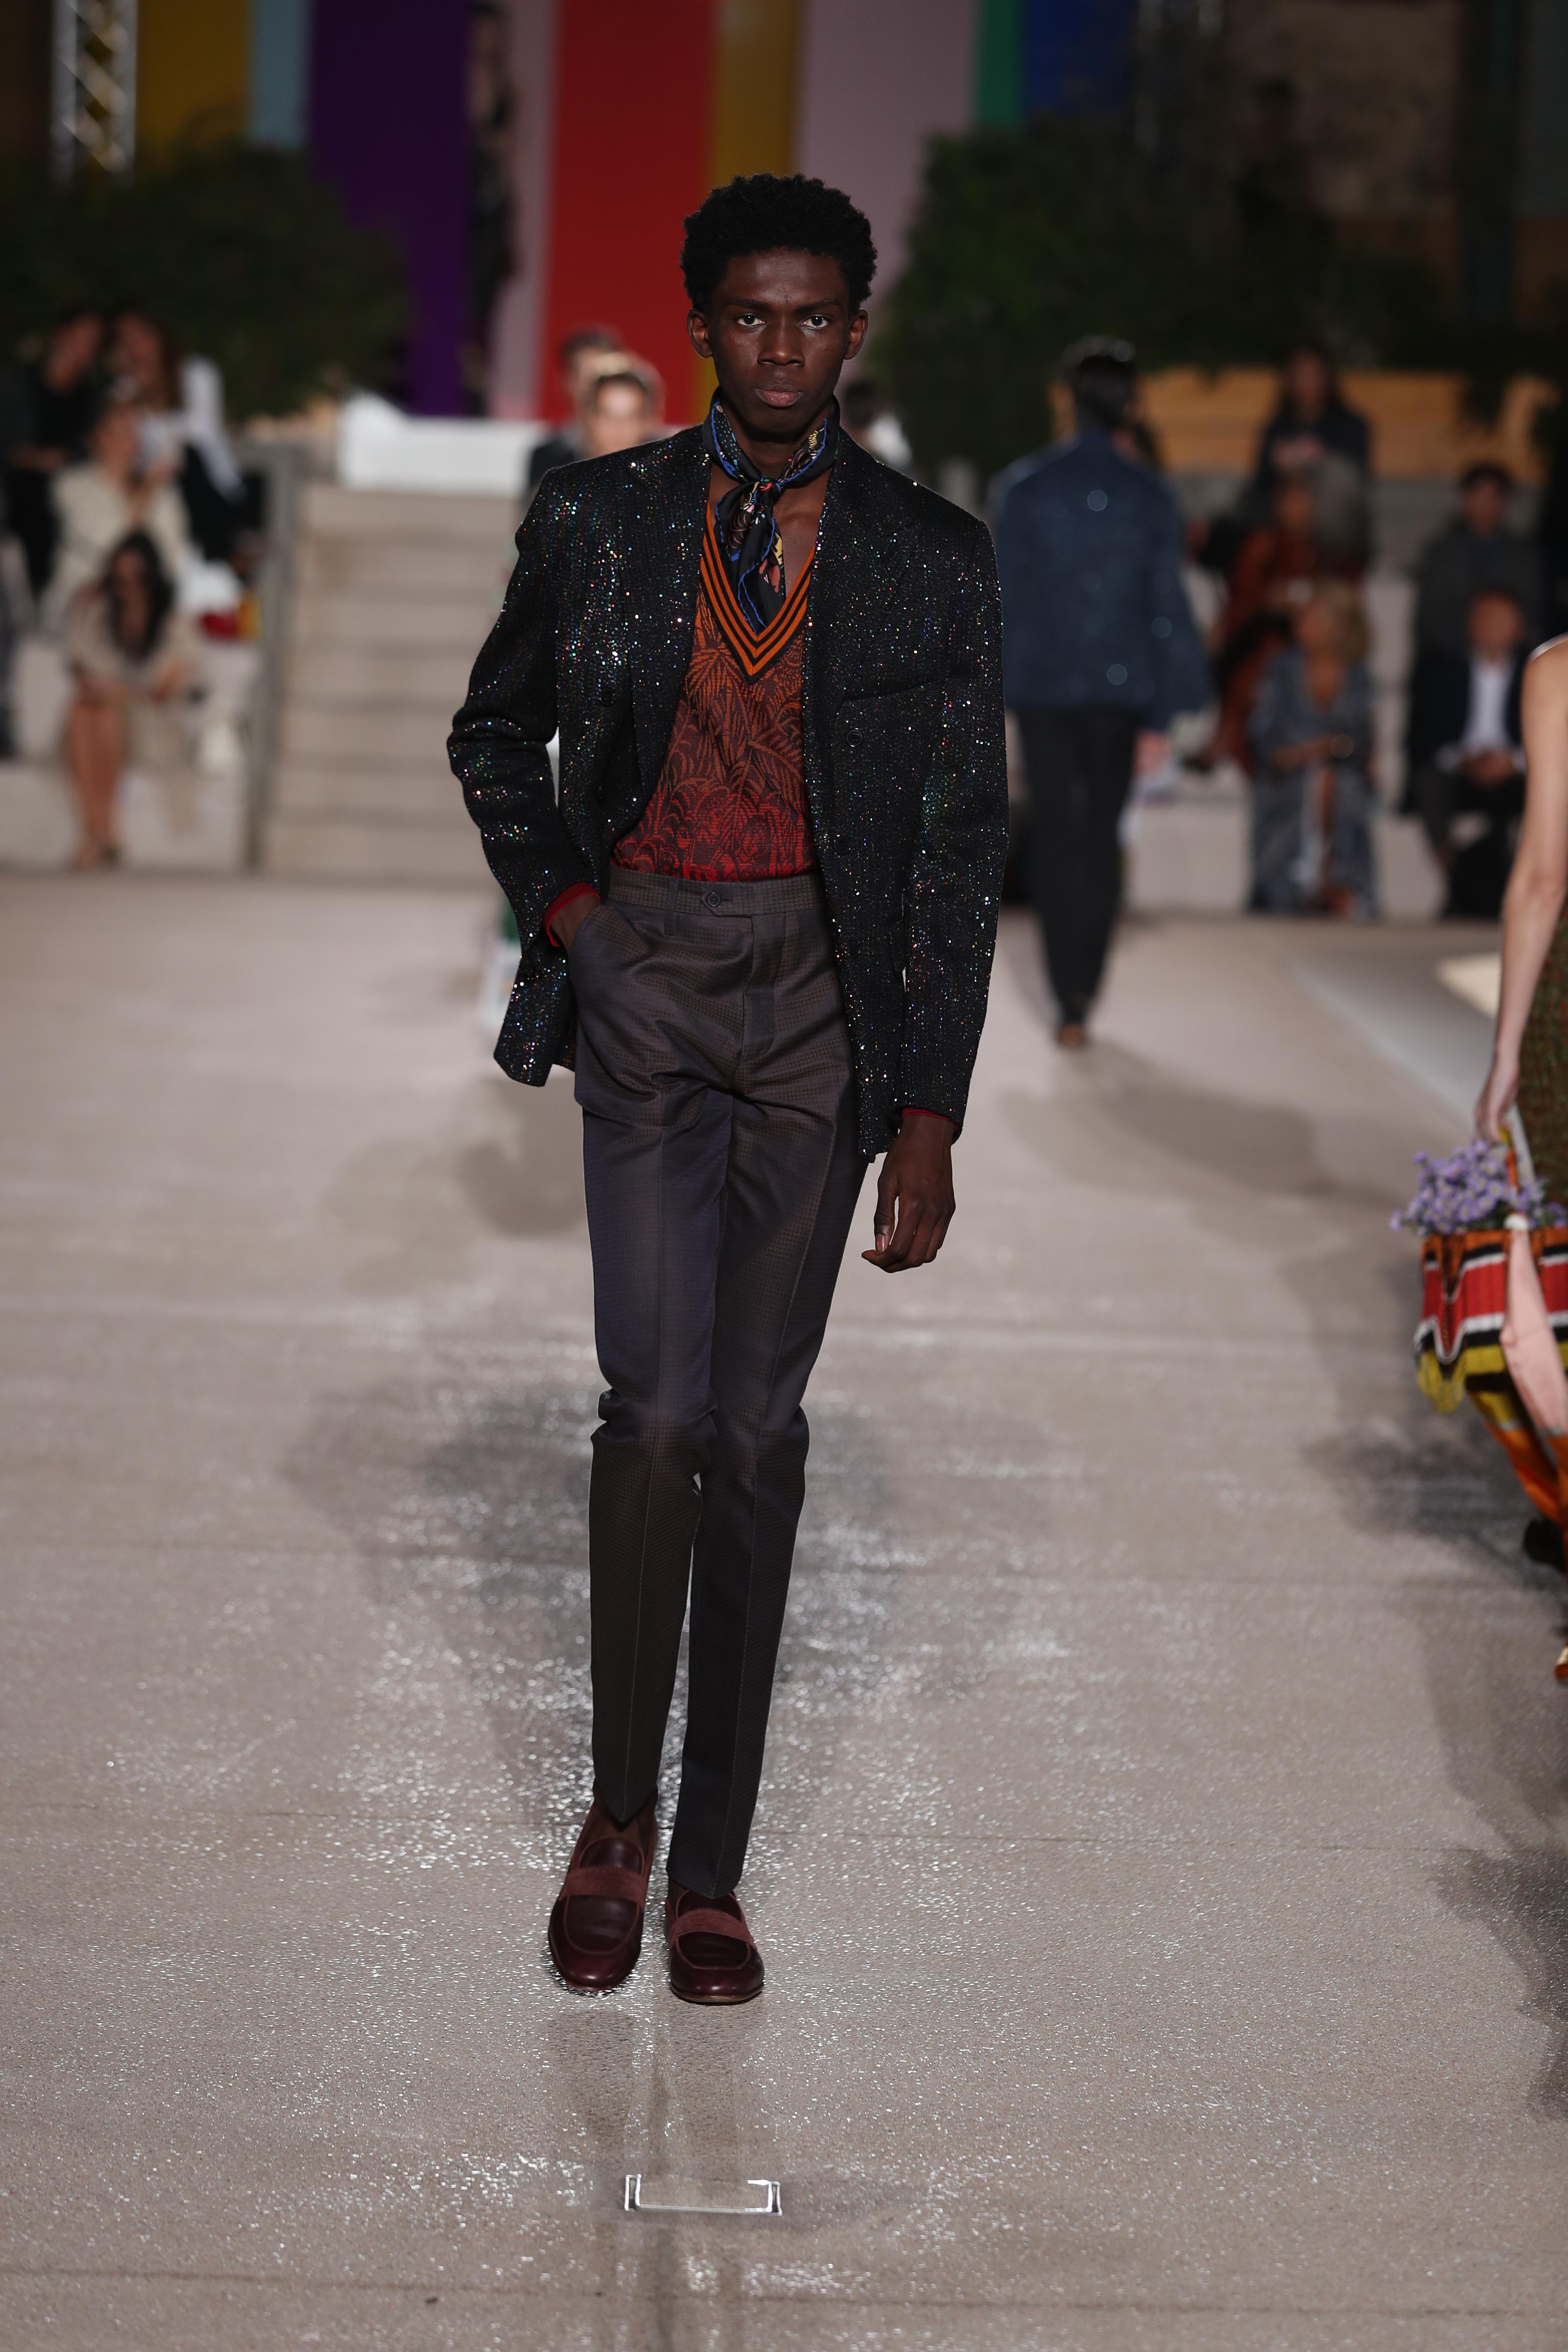 Sfilate co-ed: il new mainstream fashion